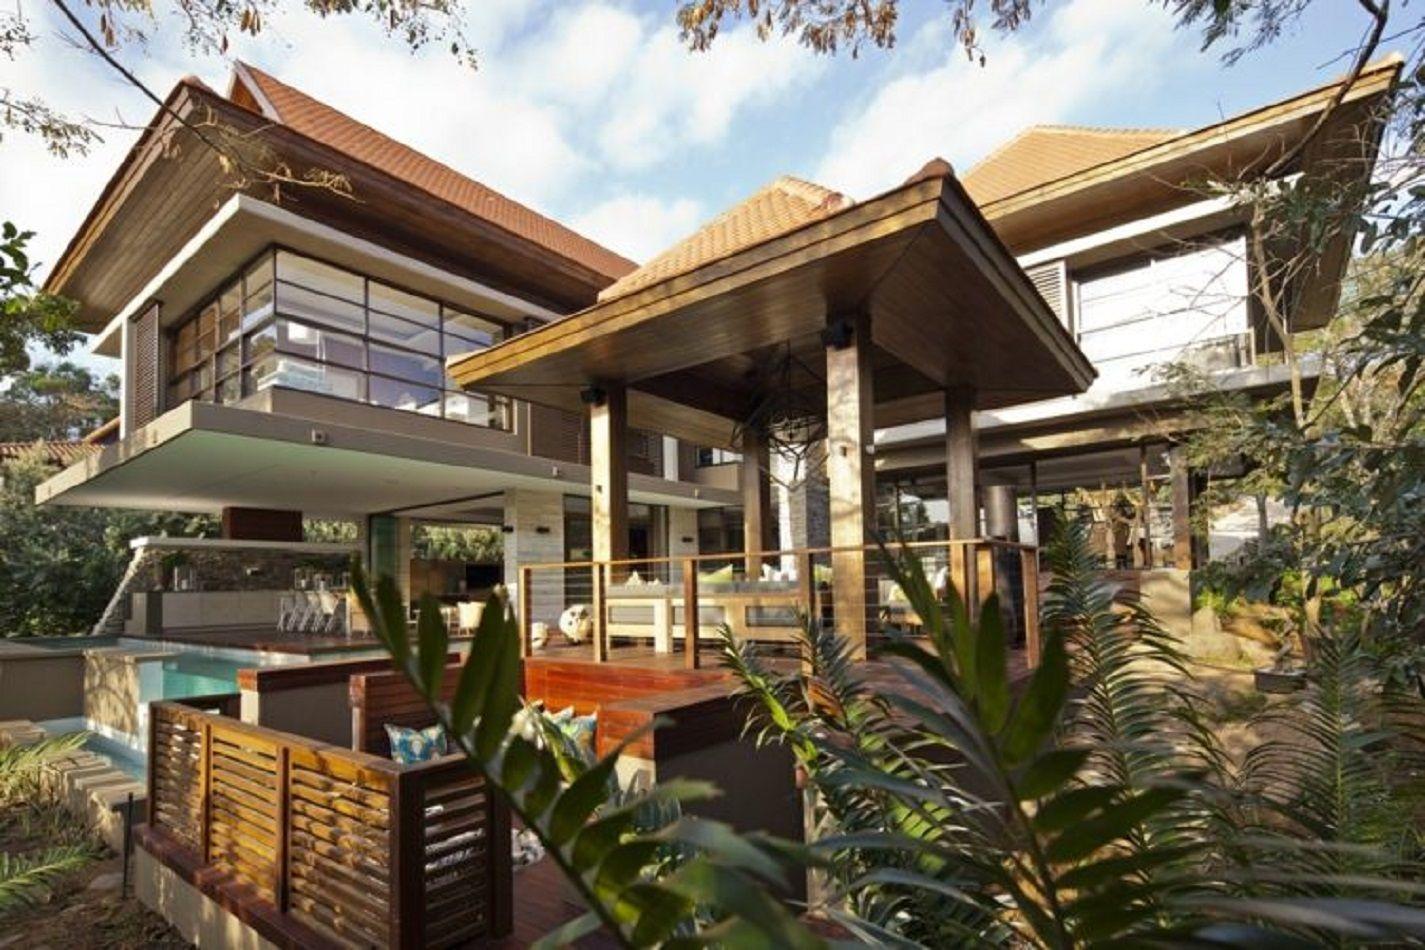 Japanese Inspired House japanese-inspired house in south africa | moderne architektur